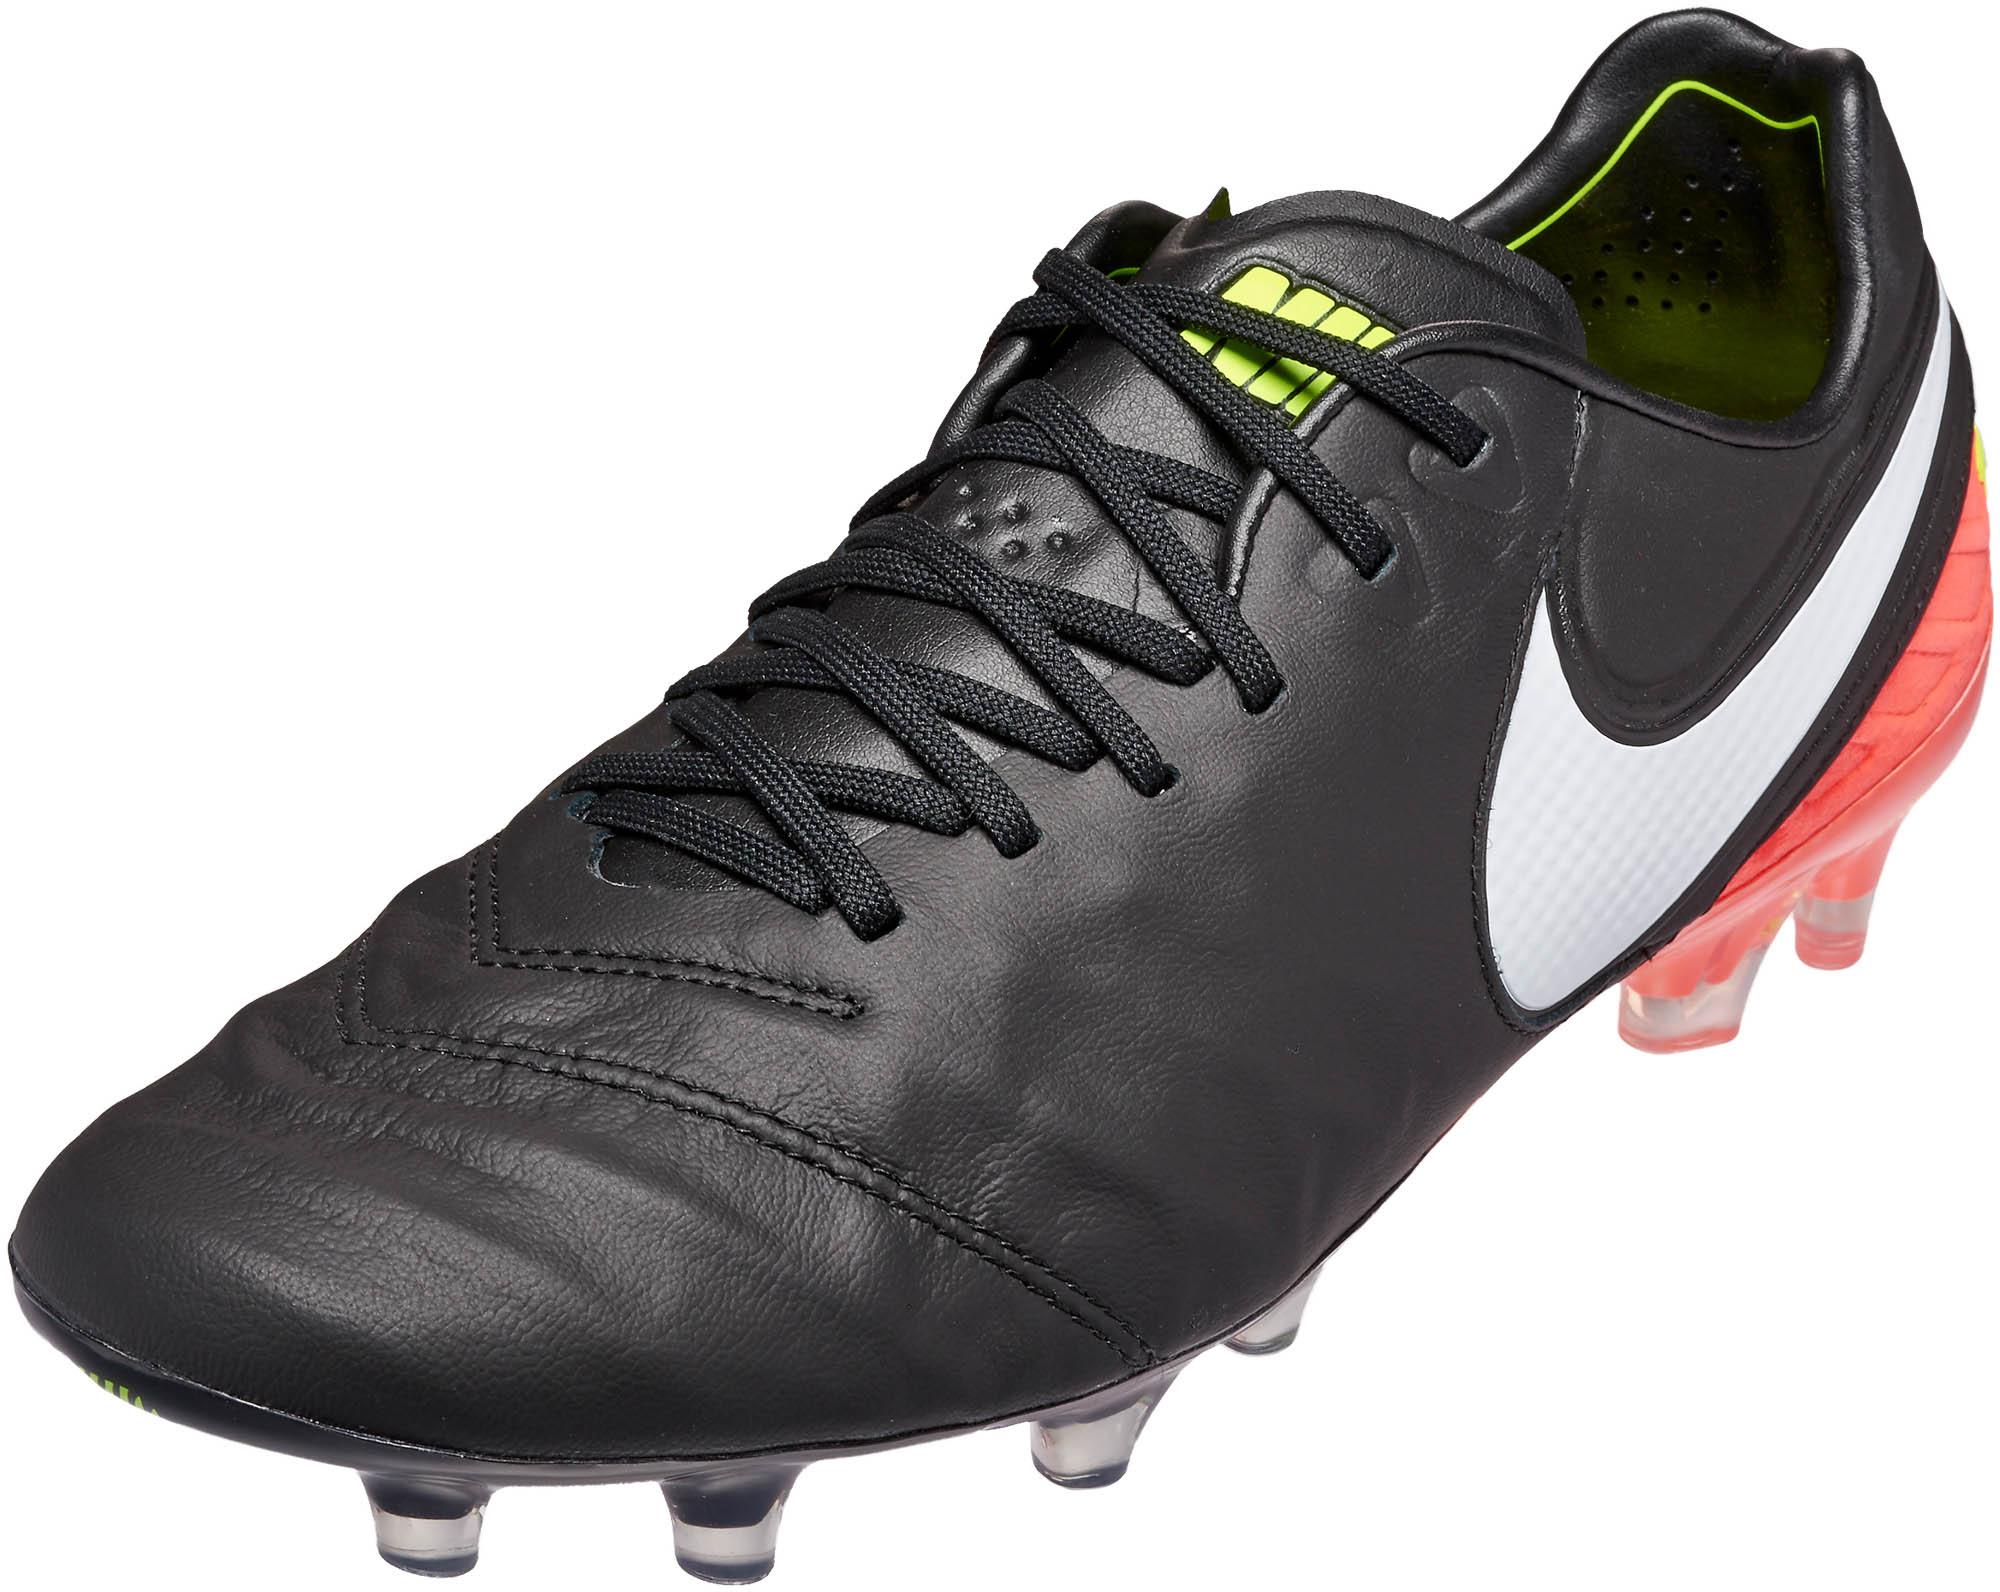 newest 82d57 1b61f Nike Tiempo Legend VI FG Soccer Cleats – Black   Hyper Orange